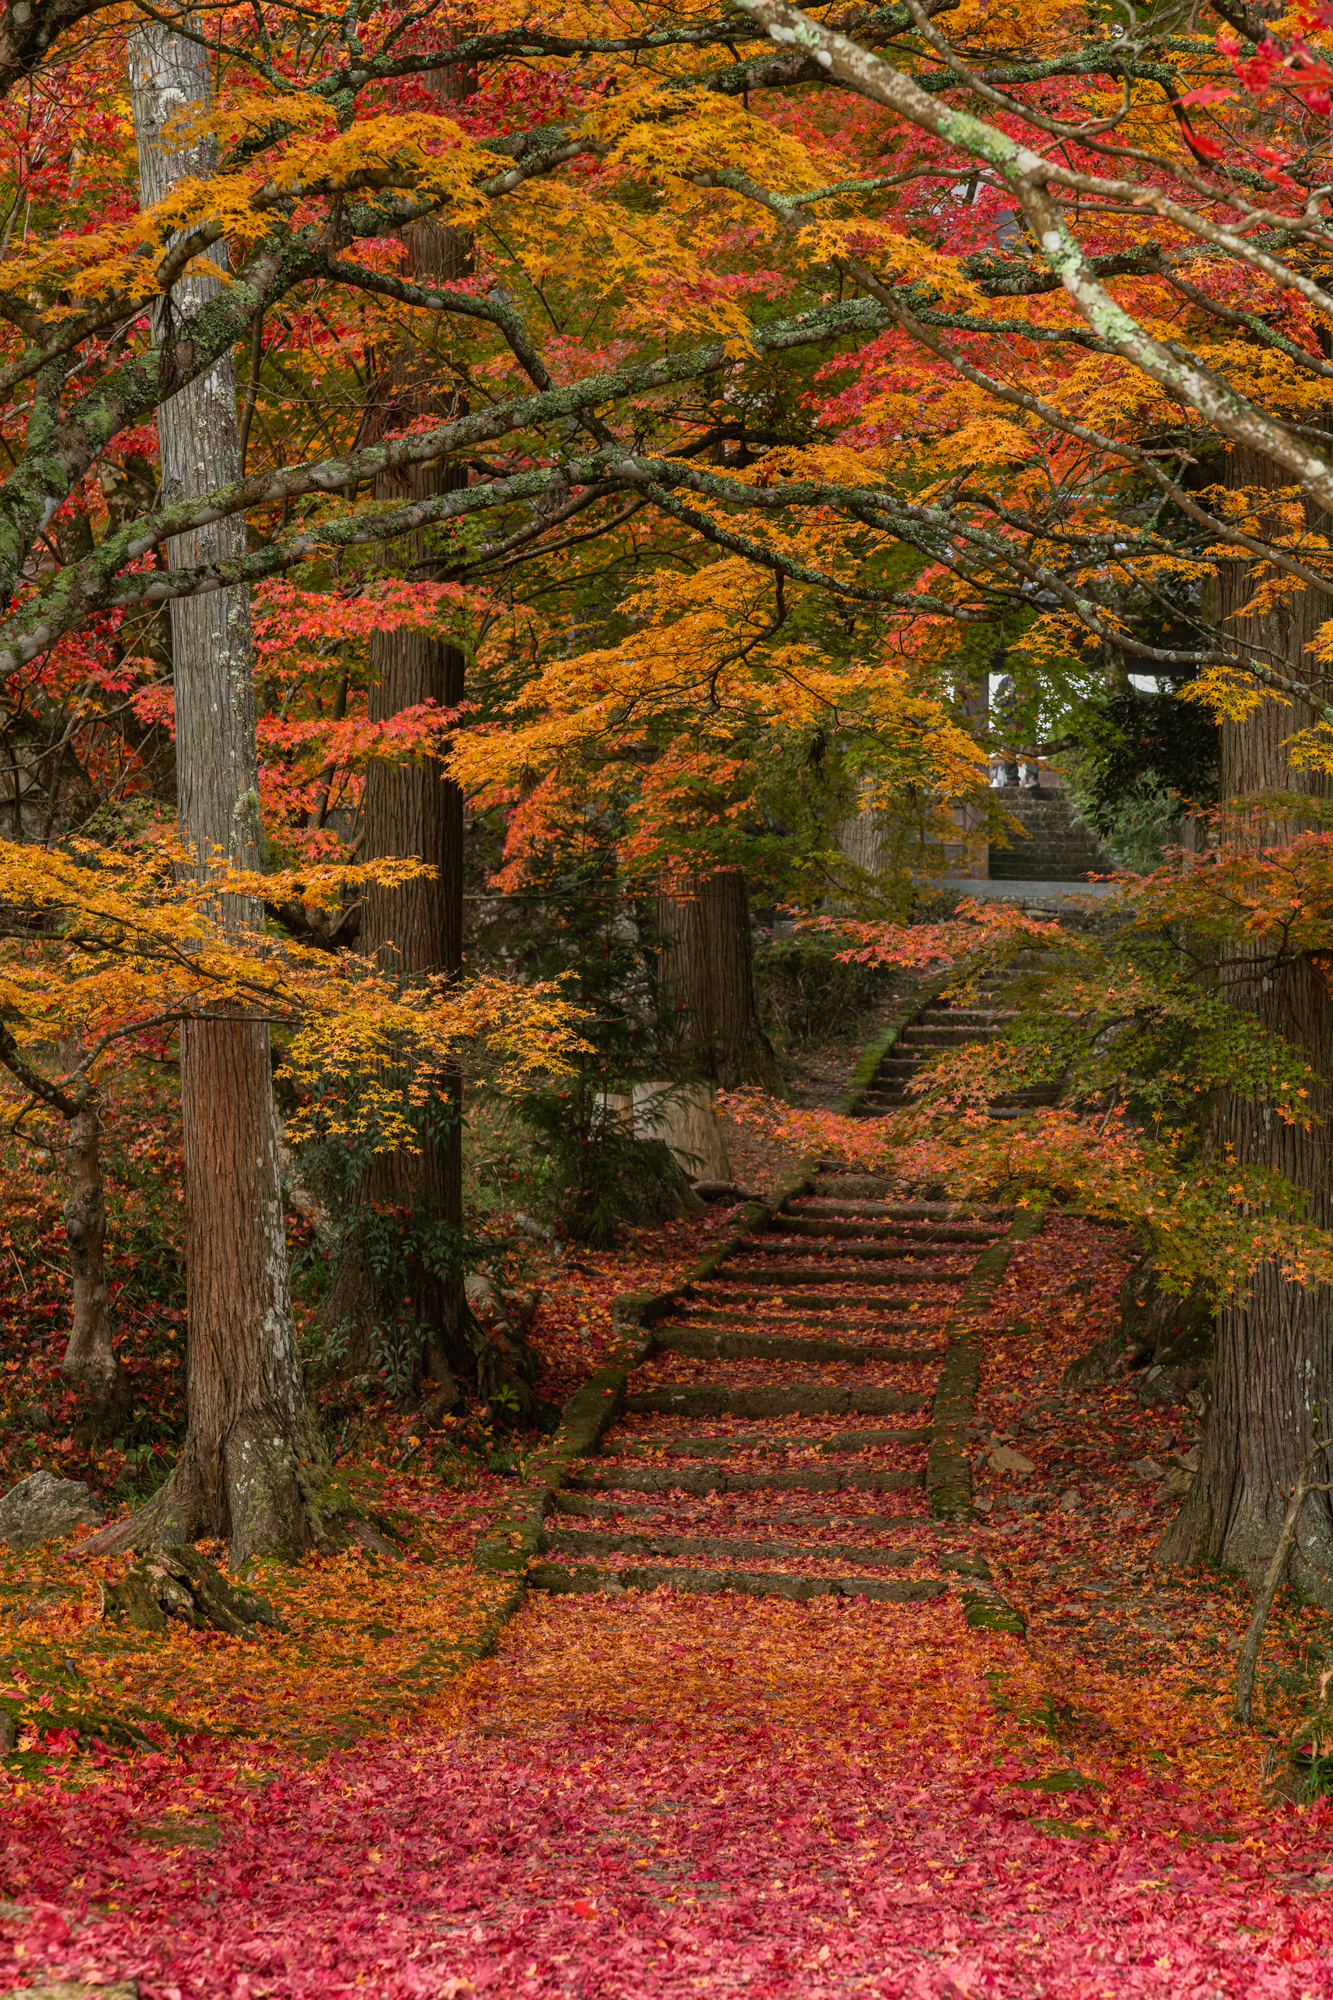 NIKON-CORPORATION_NIKON-D850_3500461042-3500571802_22858 京都  龍穏寺 Kyoto Ryoonji temple( 南丹市にある境内へ続く紅葉のトンネルが美しいおすすめの写真スポット!撮影した写真の紹介、アクセス情報・駐車場・交通手段など!)